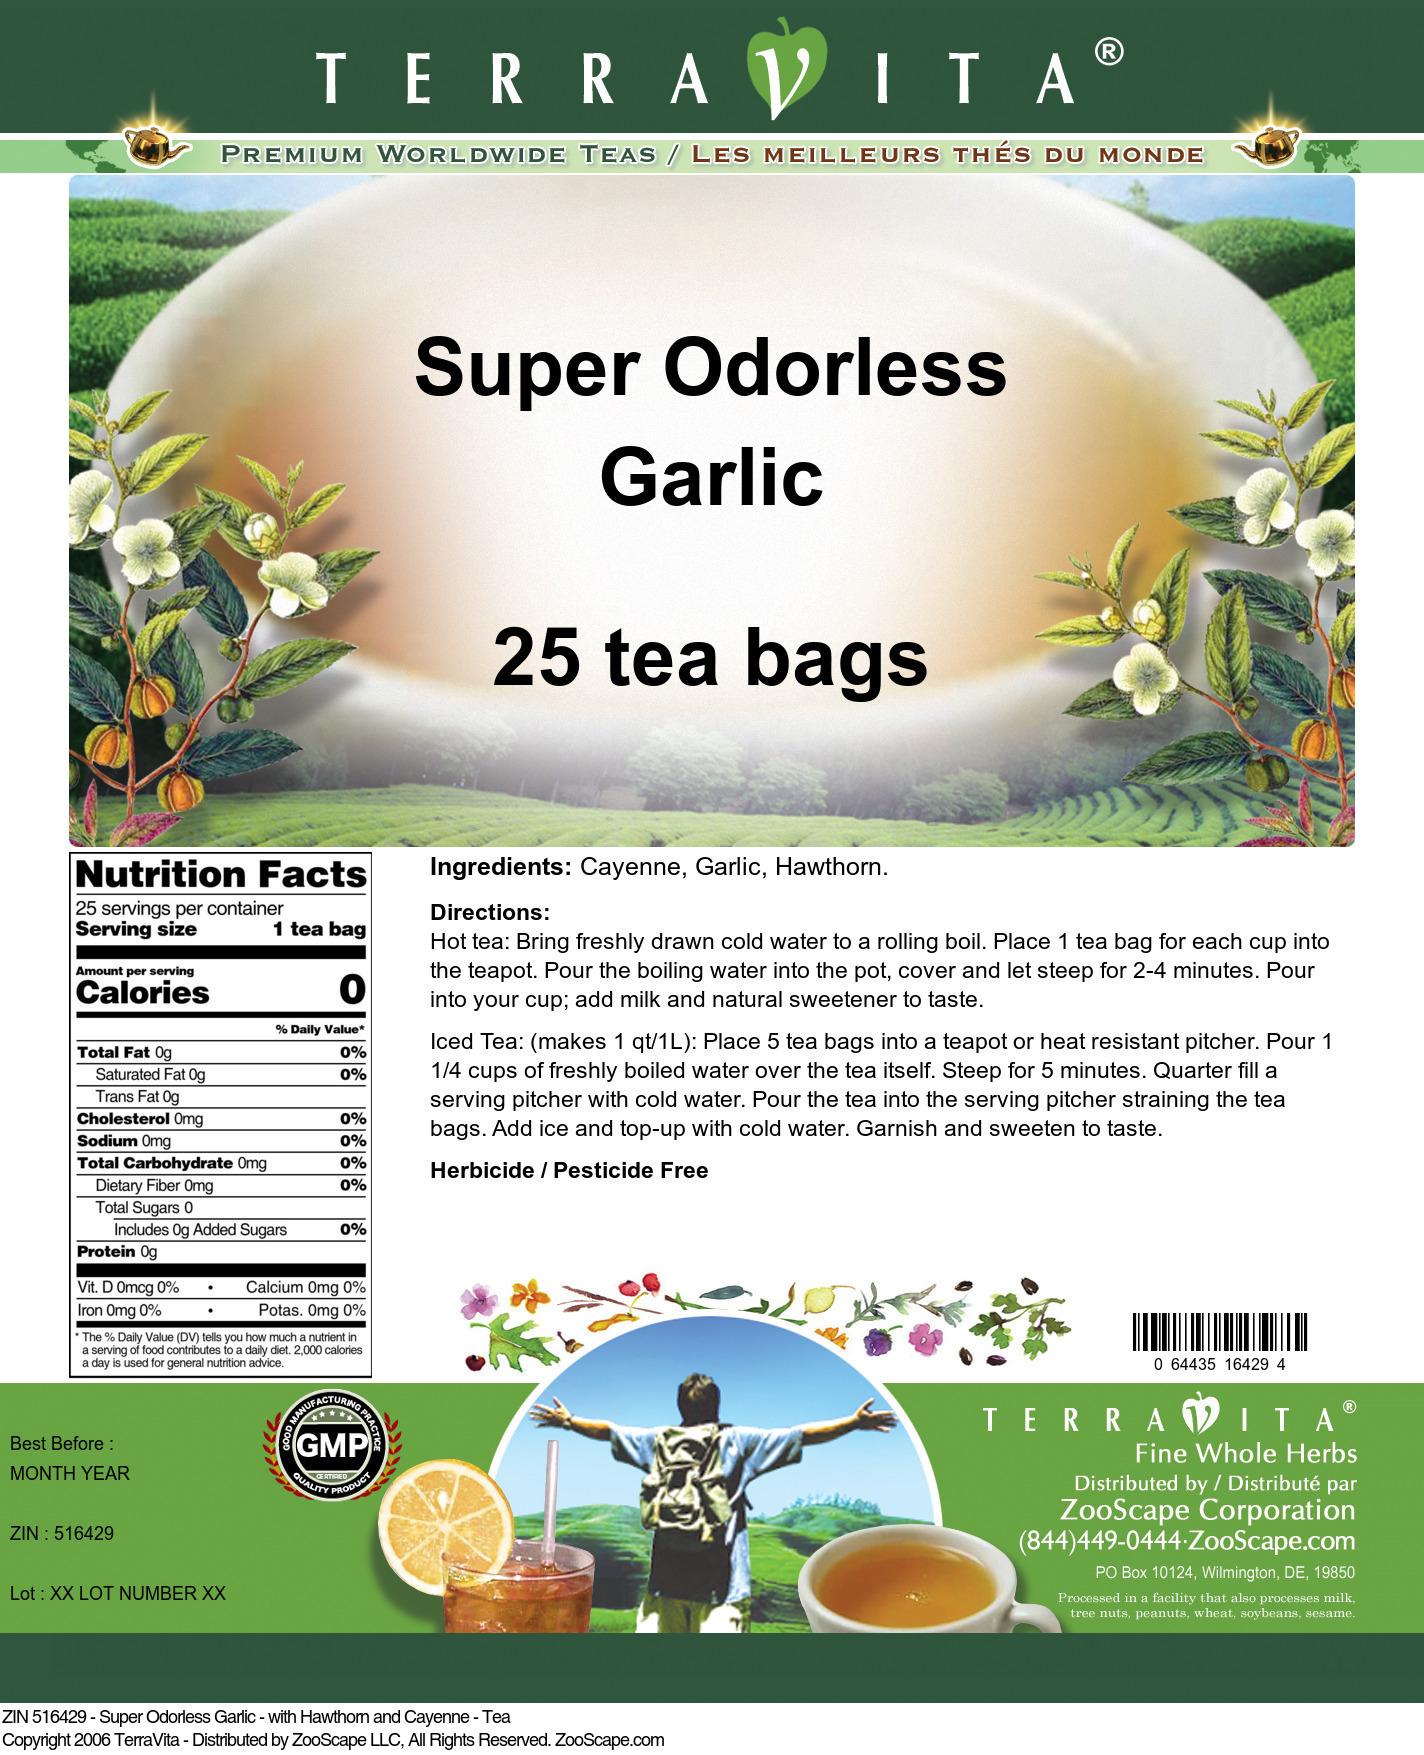 Super Odorless Garlic - with Hawthorn and Cayenne - Tea